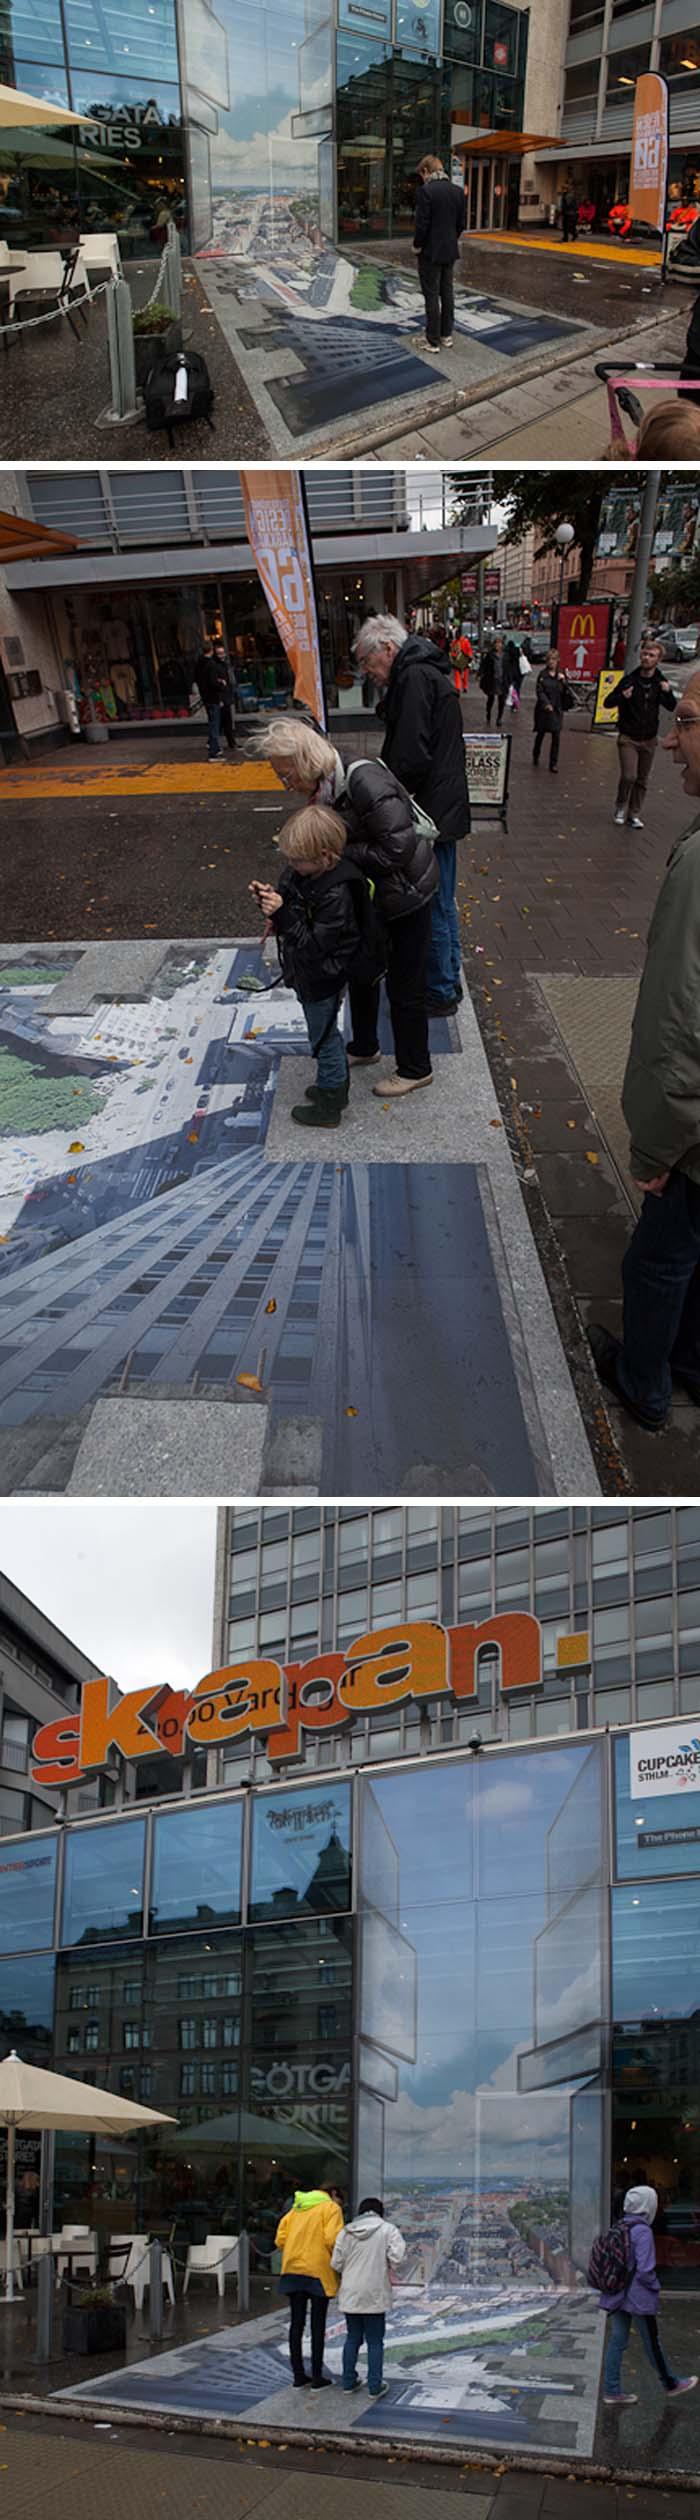 Erik Johansson, anamorphic art illusion in Sweden, Skrapan.Trompe l'oeil